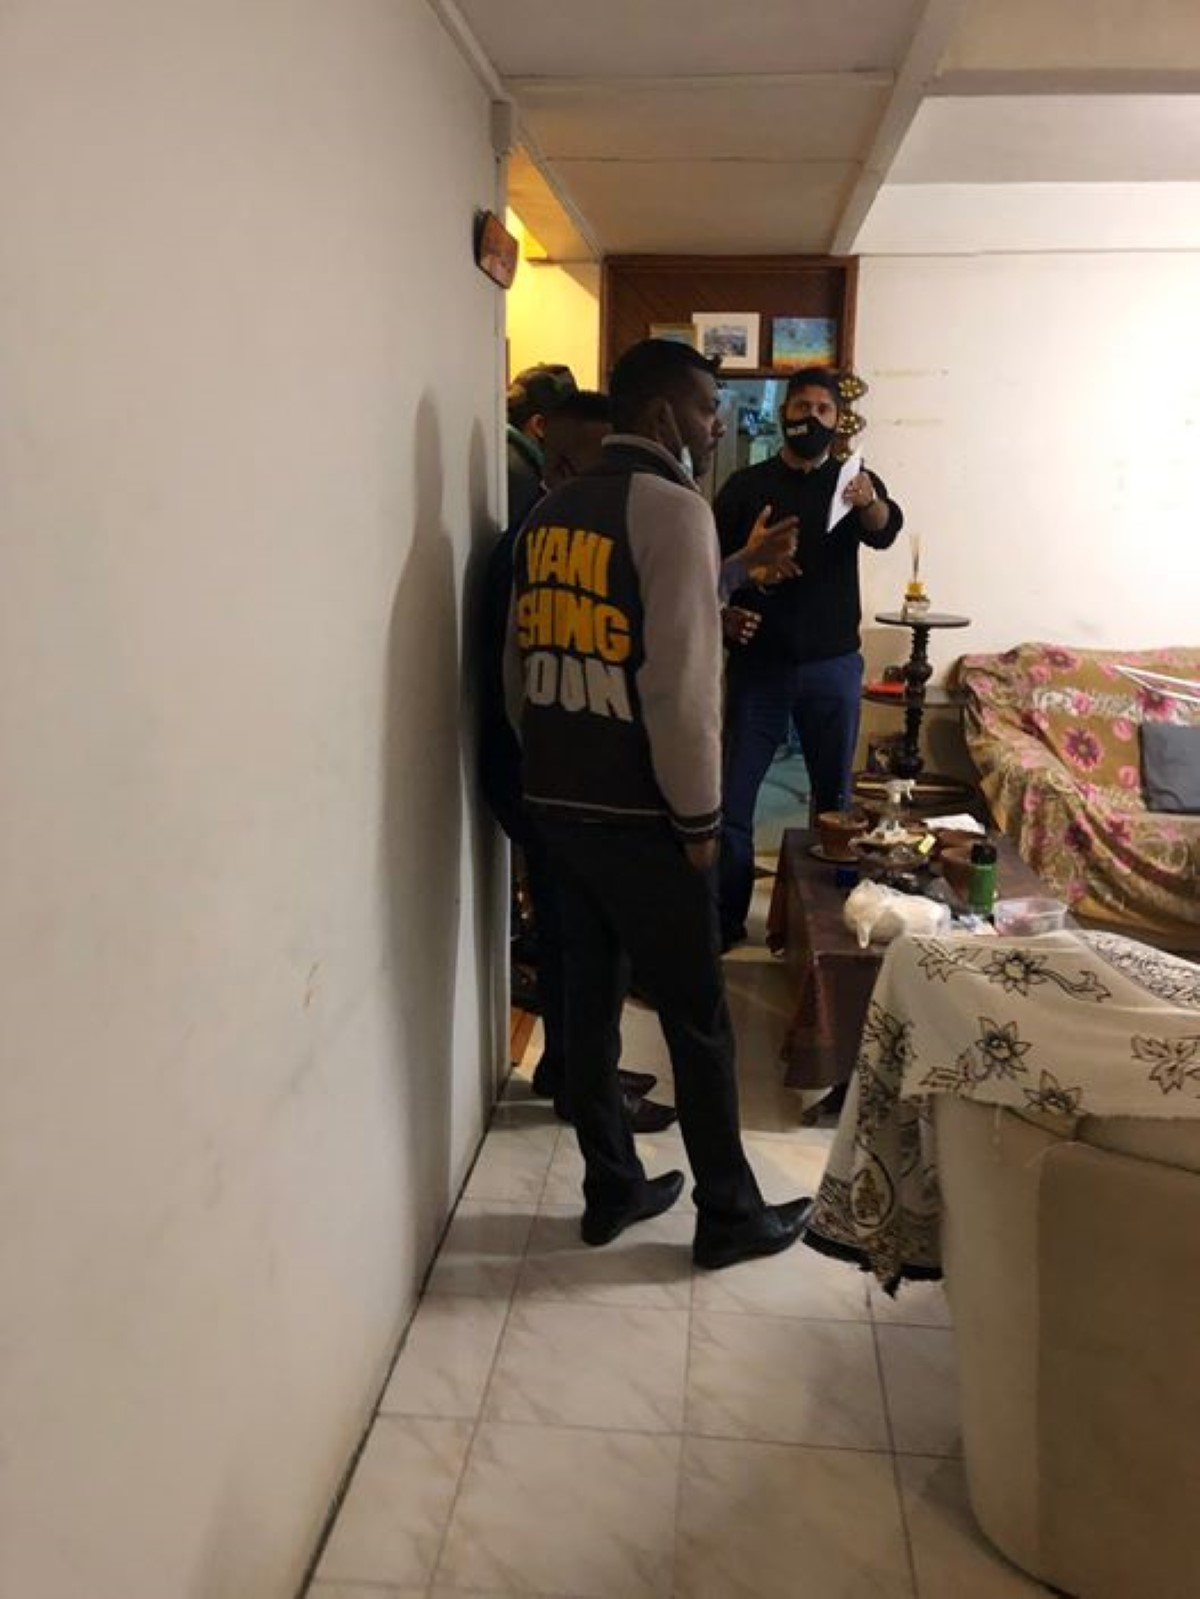 Tania Diolle fait arrêter l'internaute Farihah Soobrattee Ruhomaully